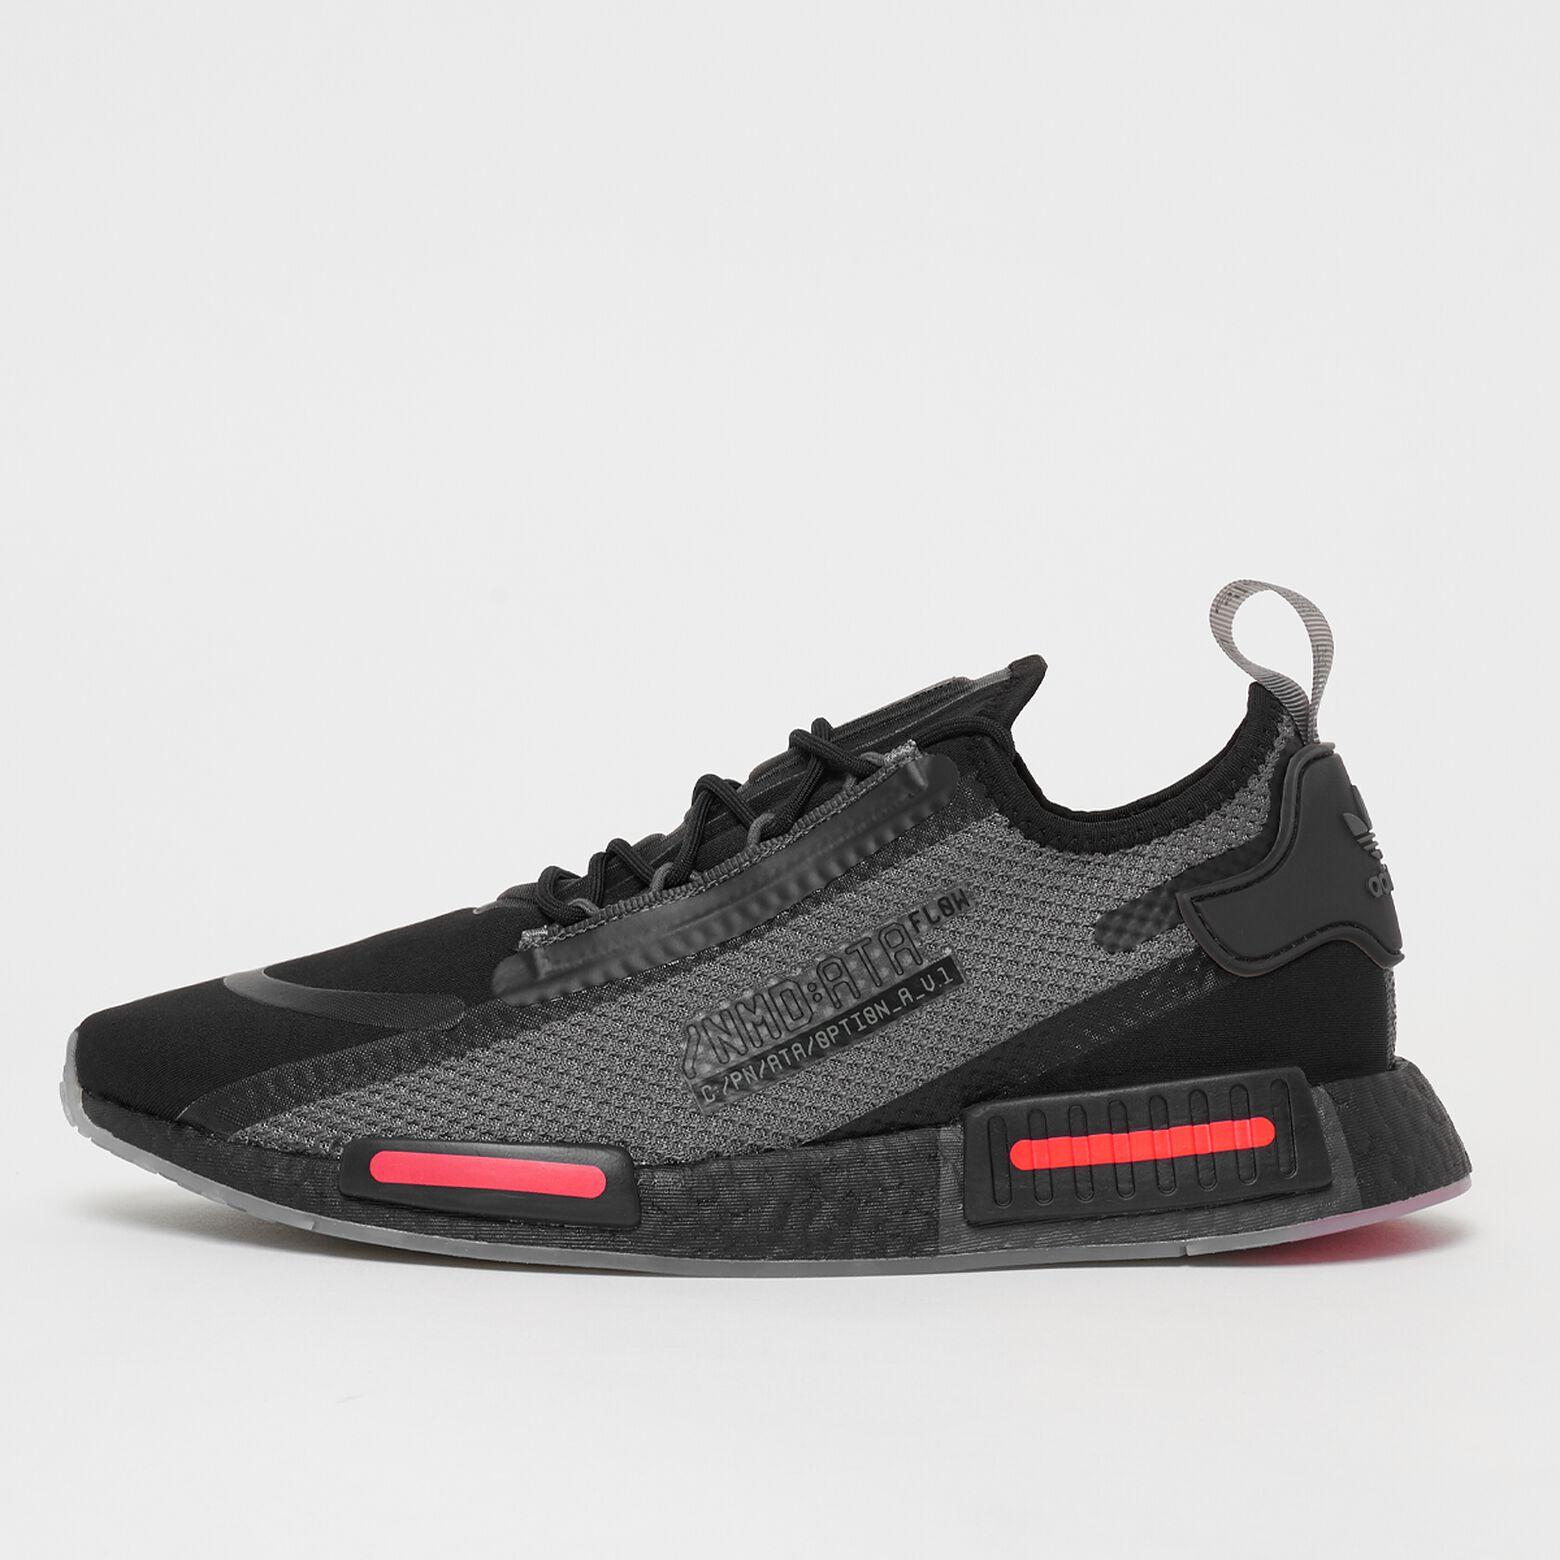 ADIDAS ORIGINALS NMD_R1 SPECTOO Sneaker black/grey five/solar red Gr.40-41